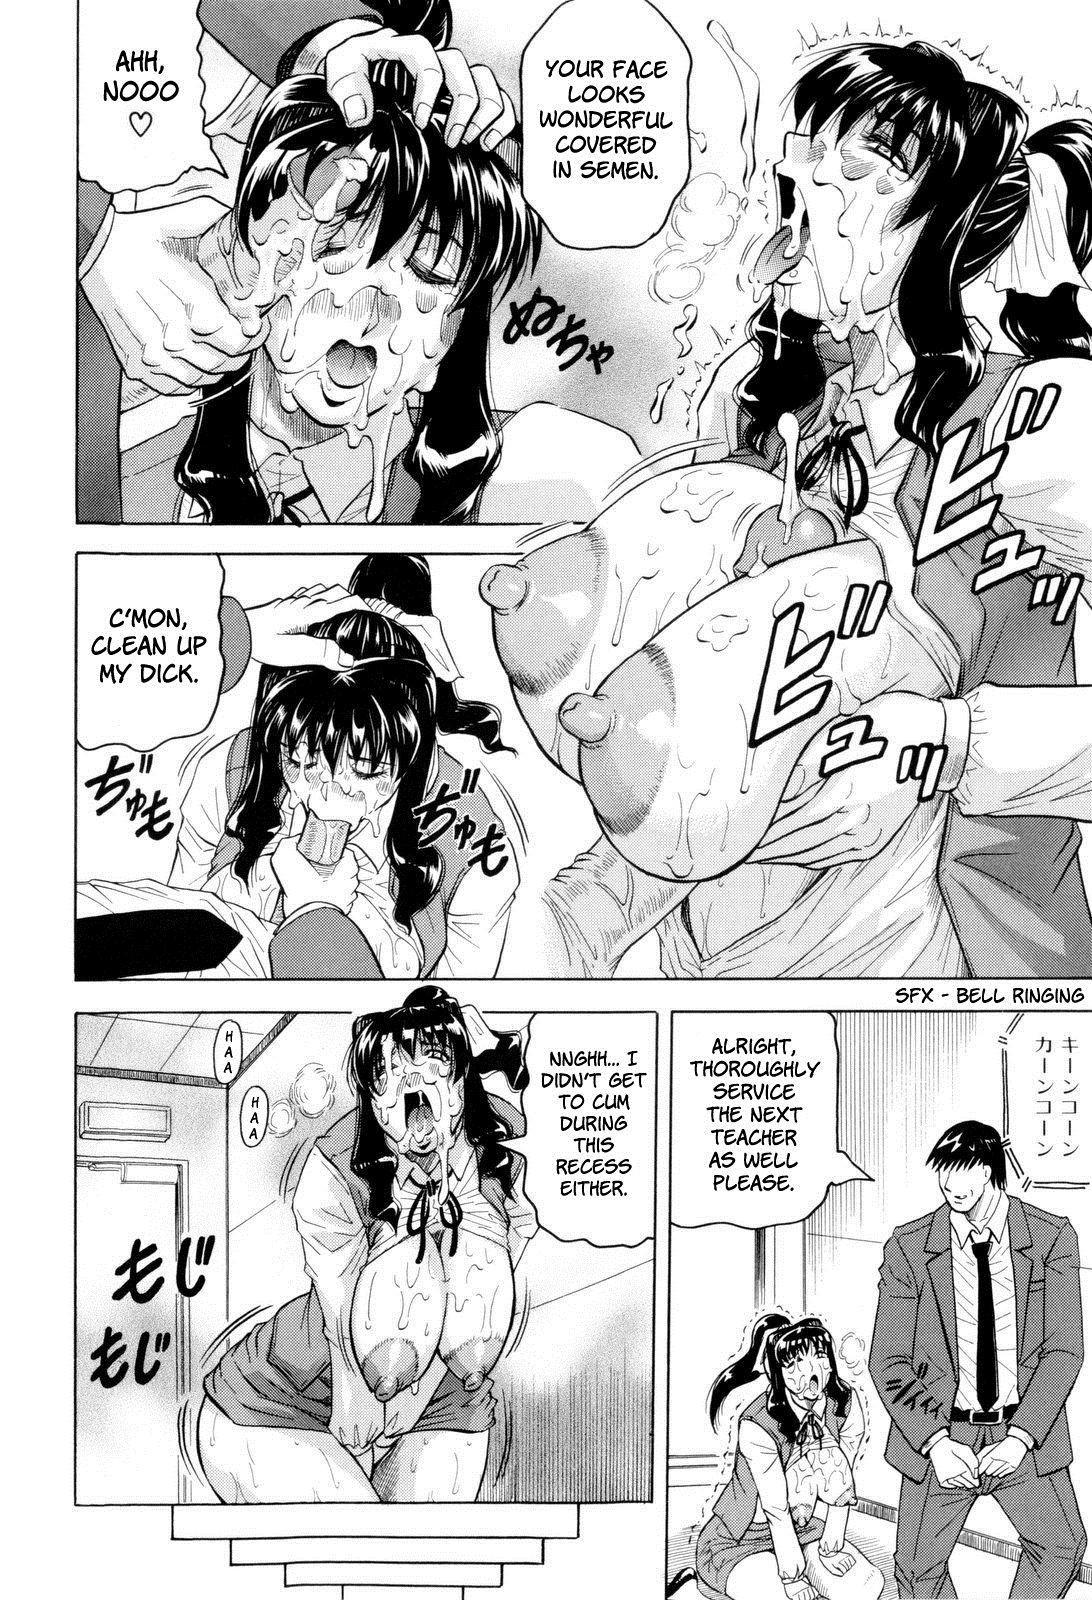 Sensei ni Dashitee! - It ejaculates in the teacher! 149